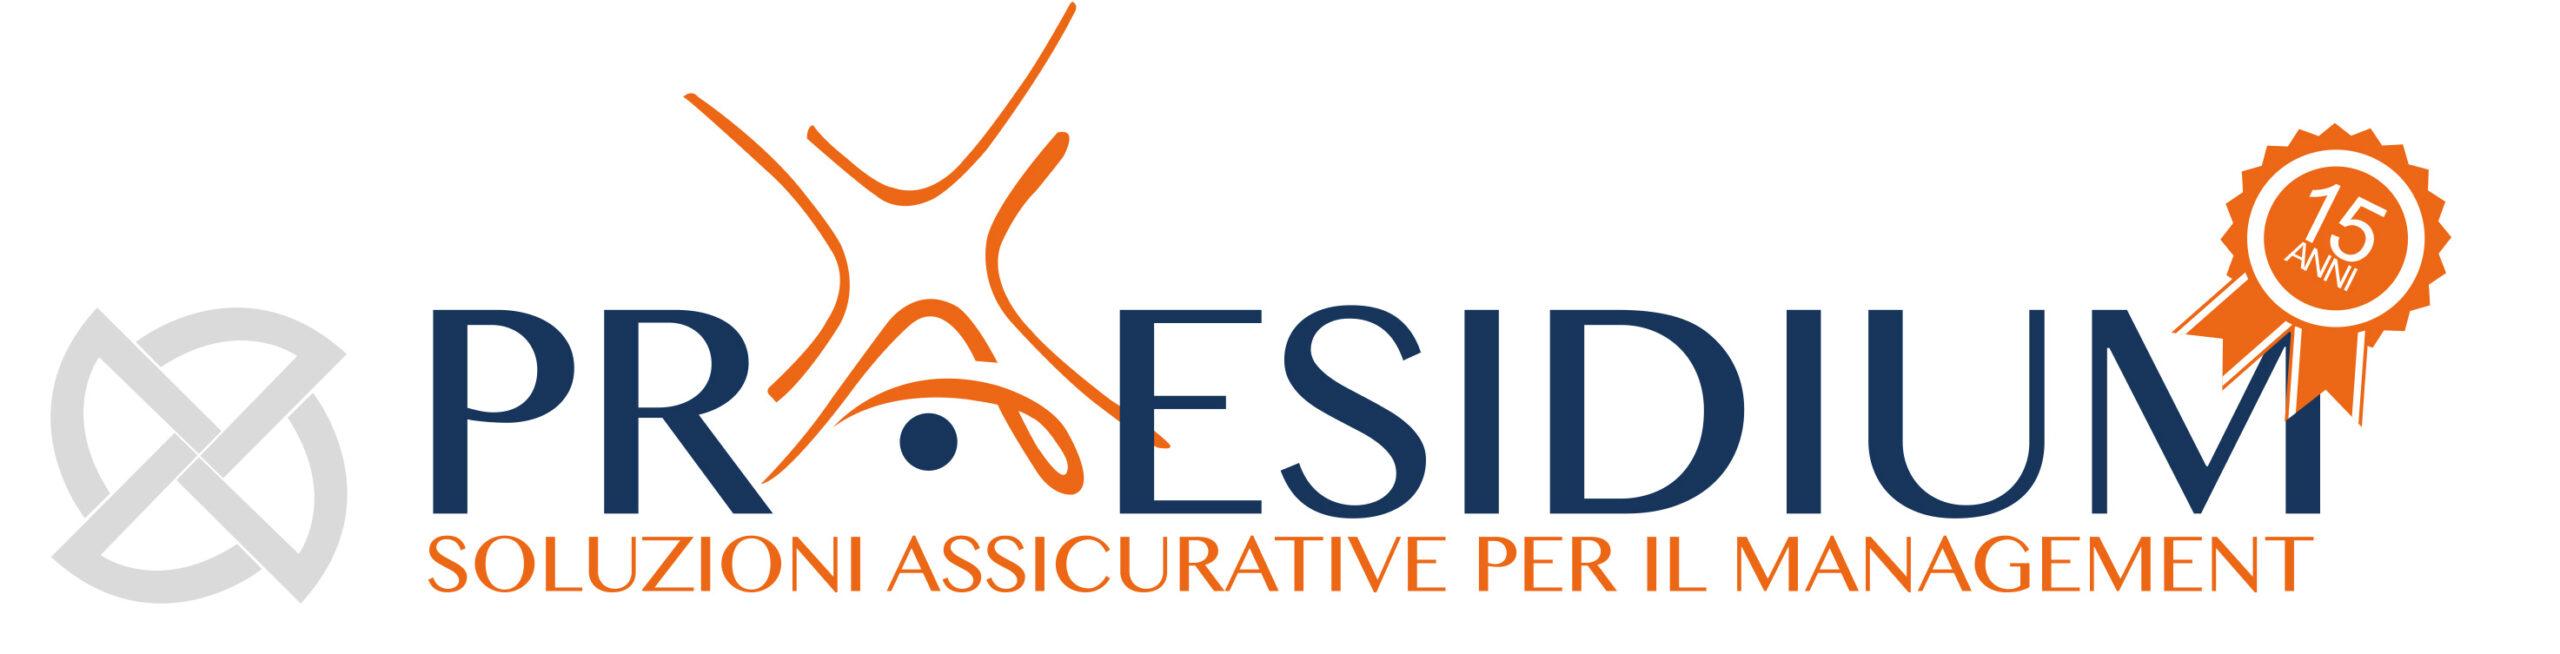 Praesidium S.p.A. 2005-2020